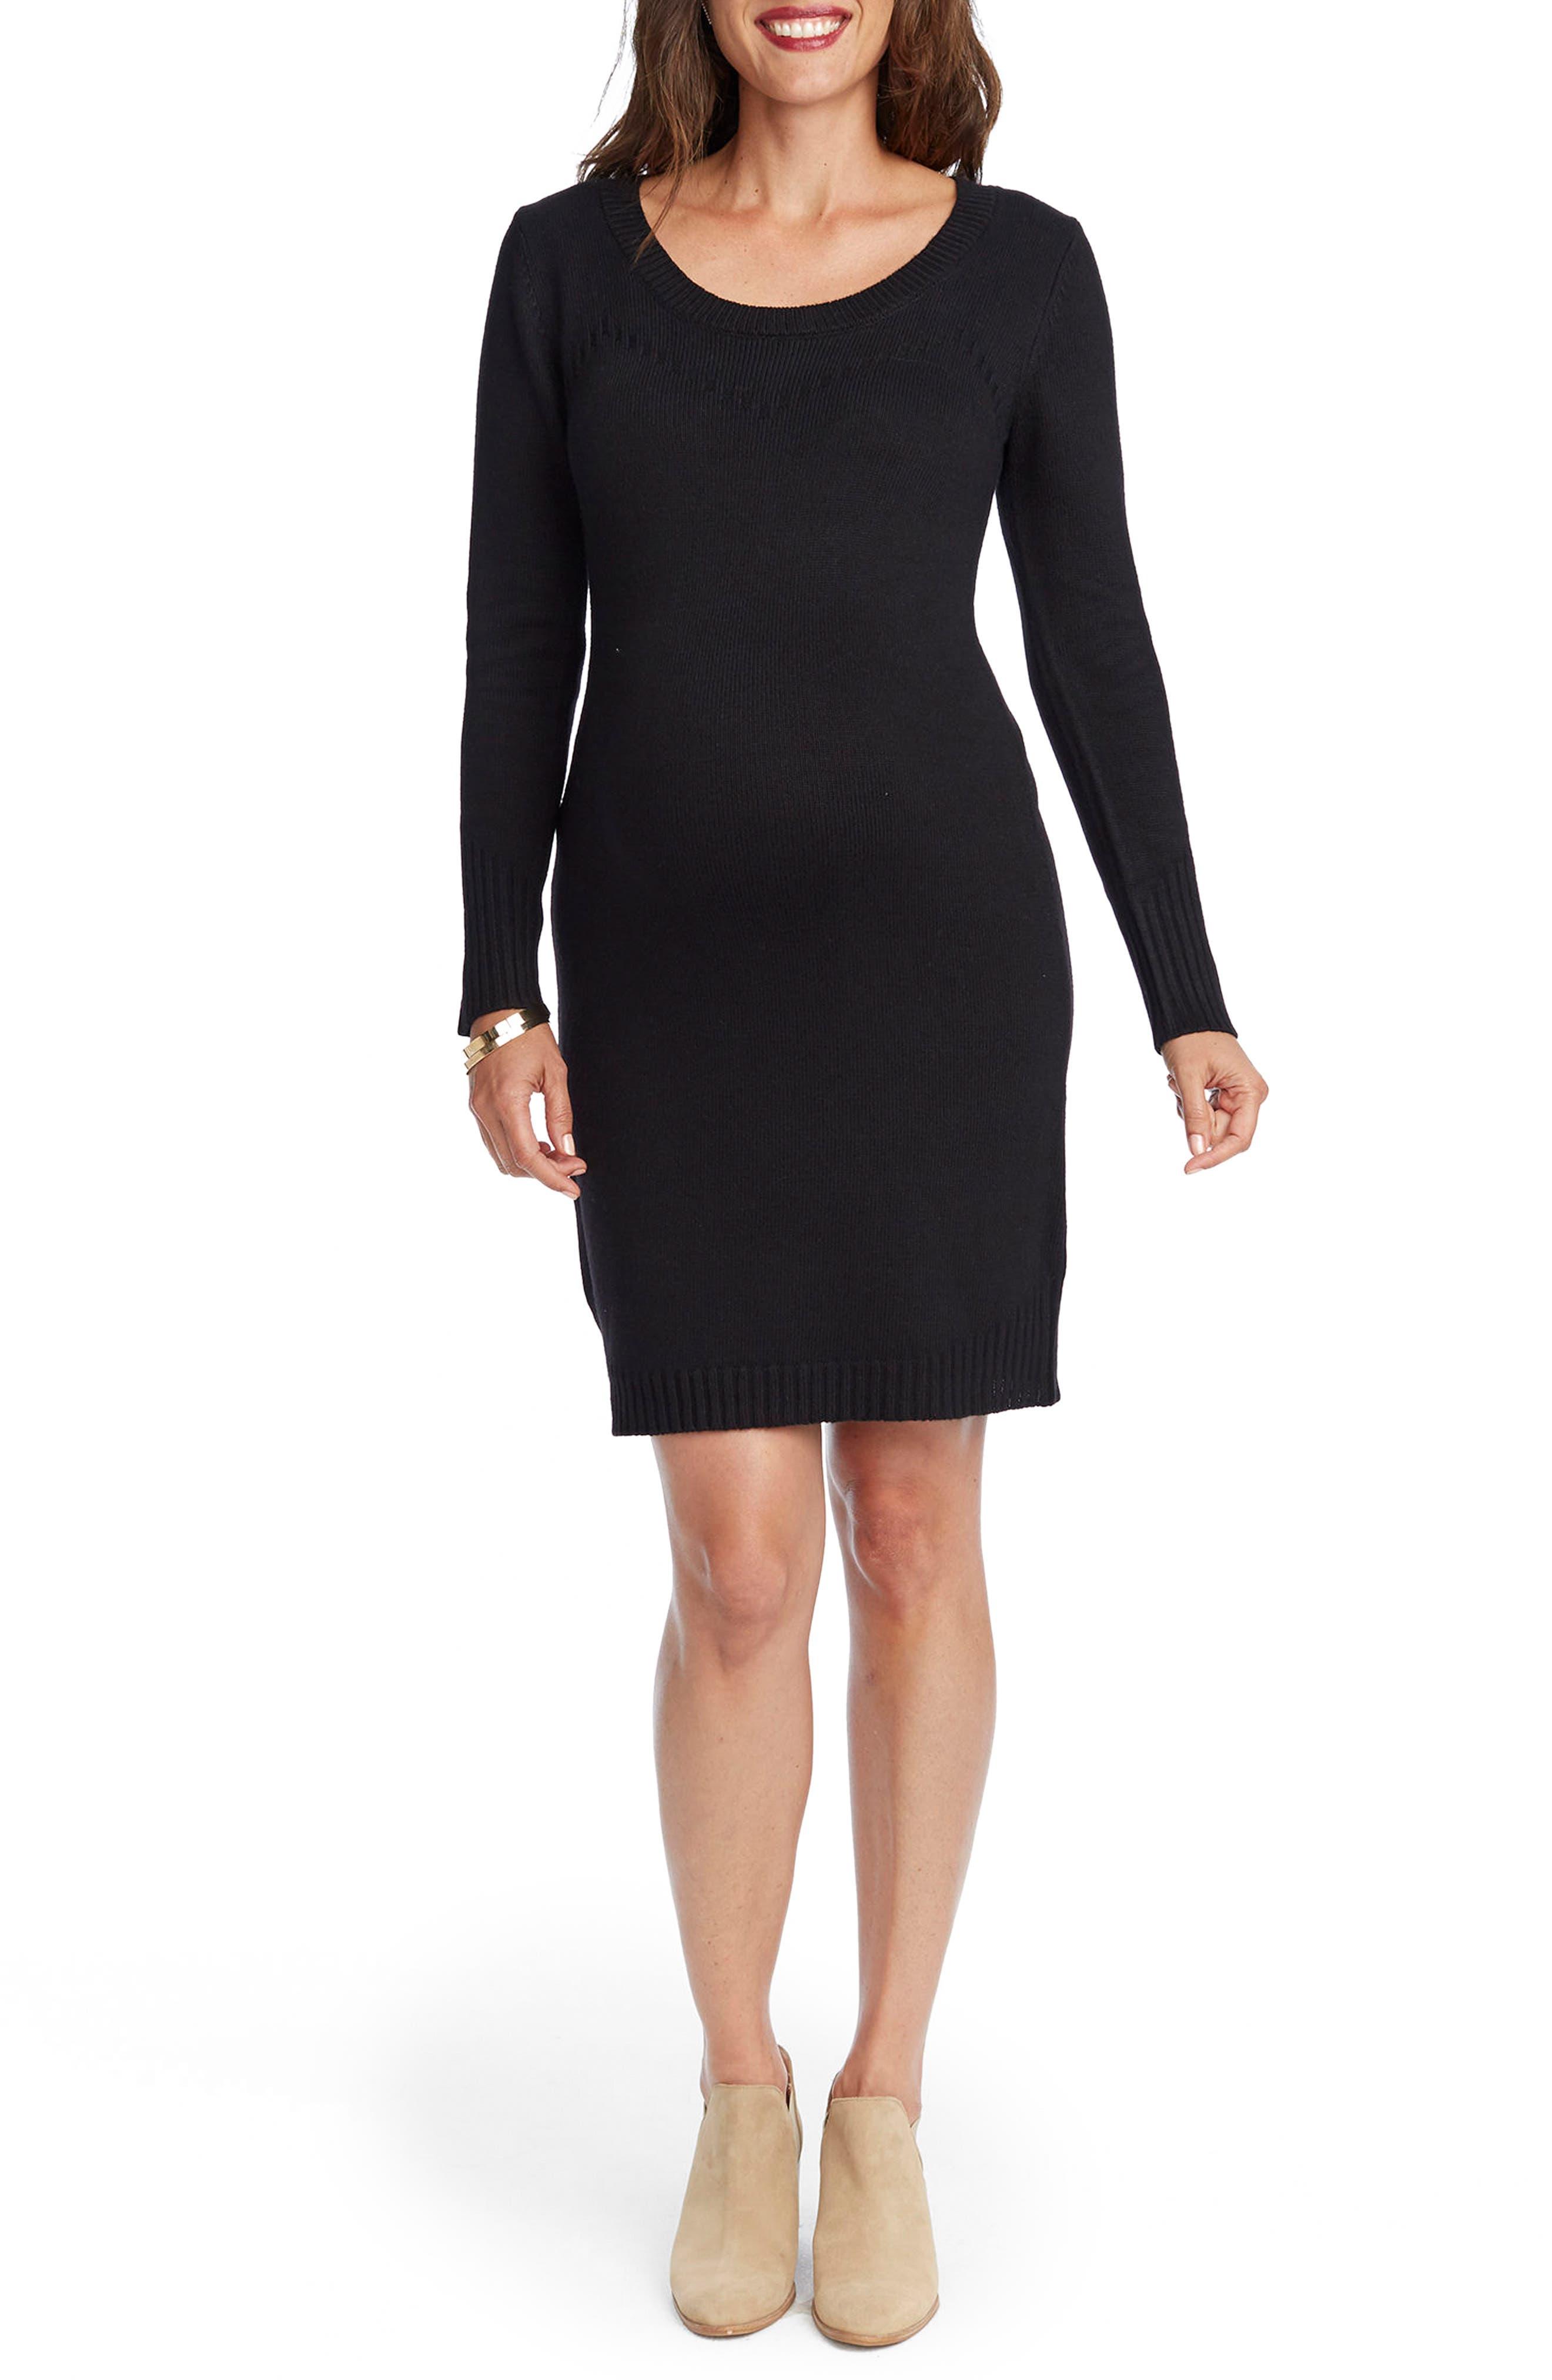 ROSIE POPE Karlie Maternity Sweater Dress in Black